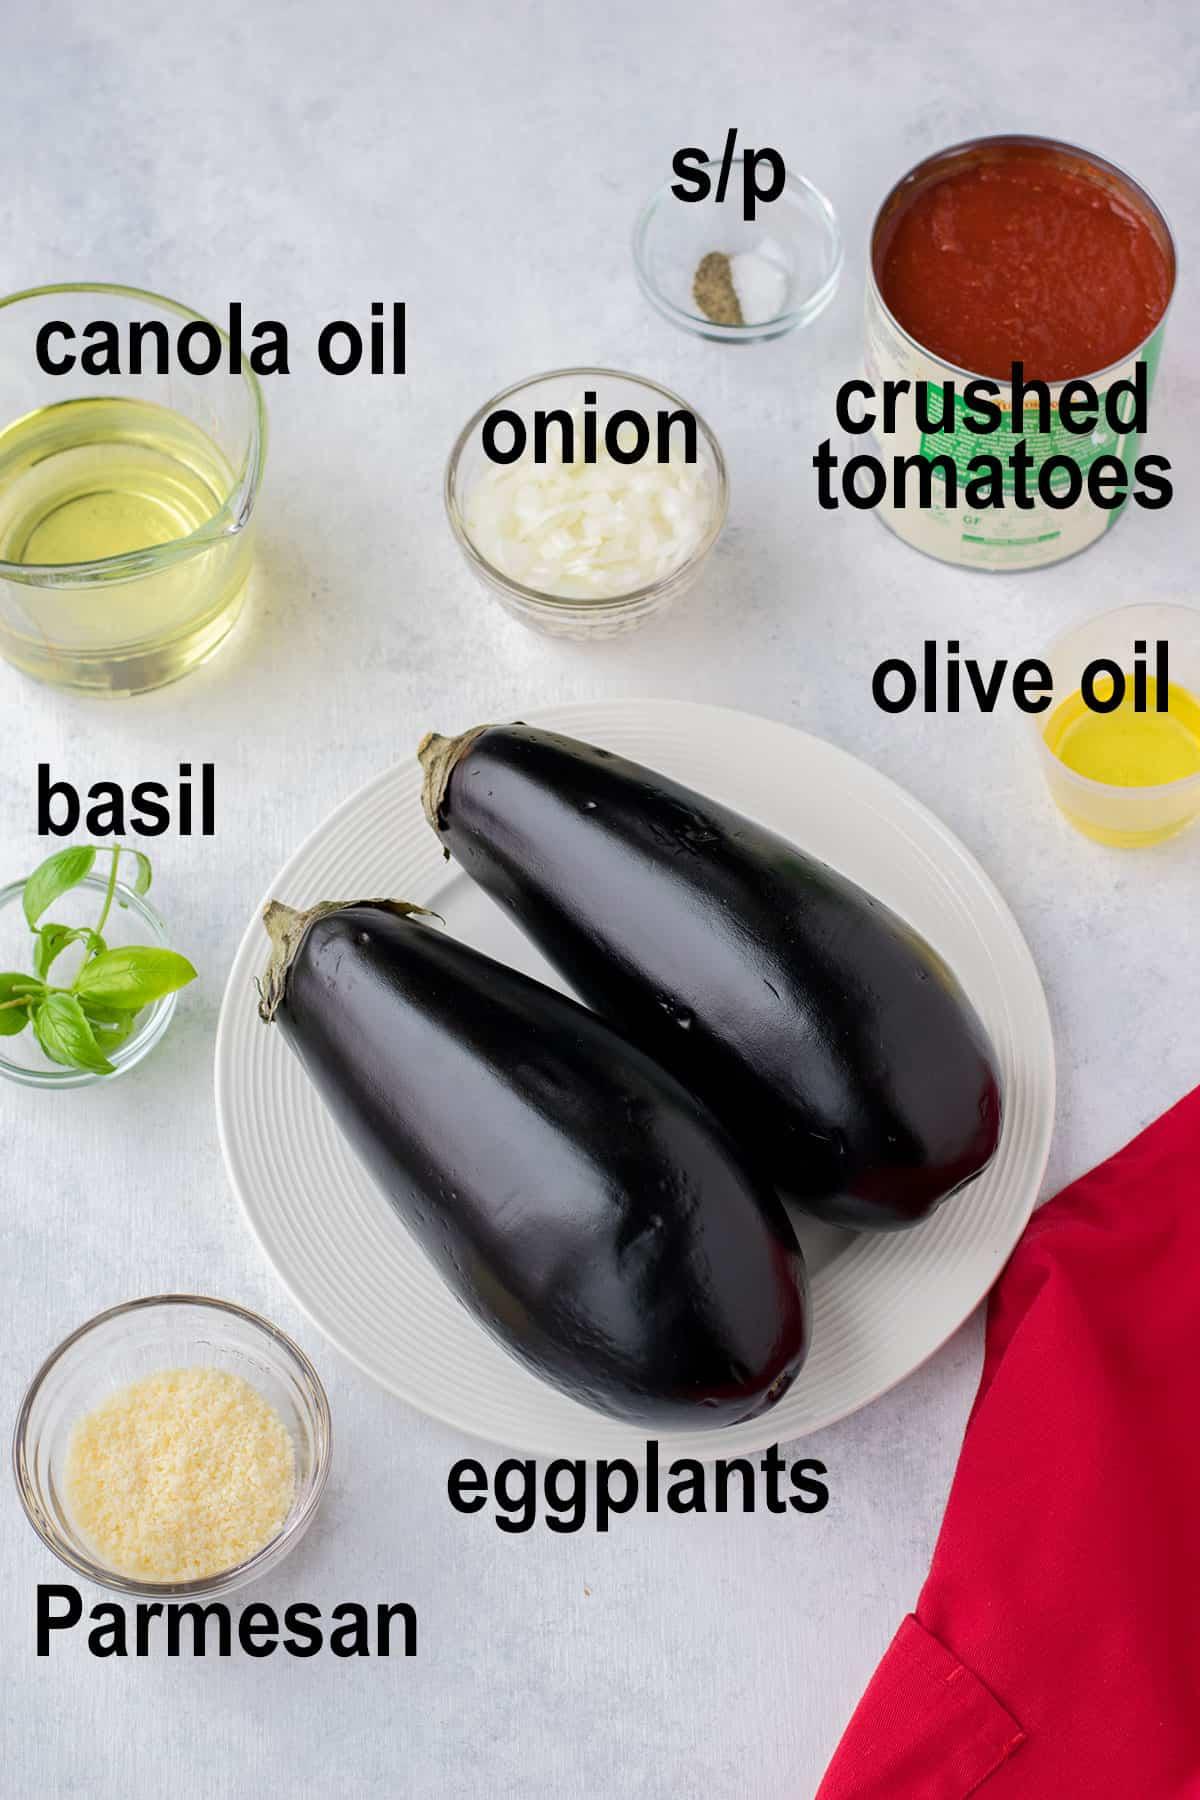 eggplants, Parmesan, basil, oil and tomato sauce ingredients